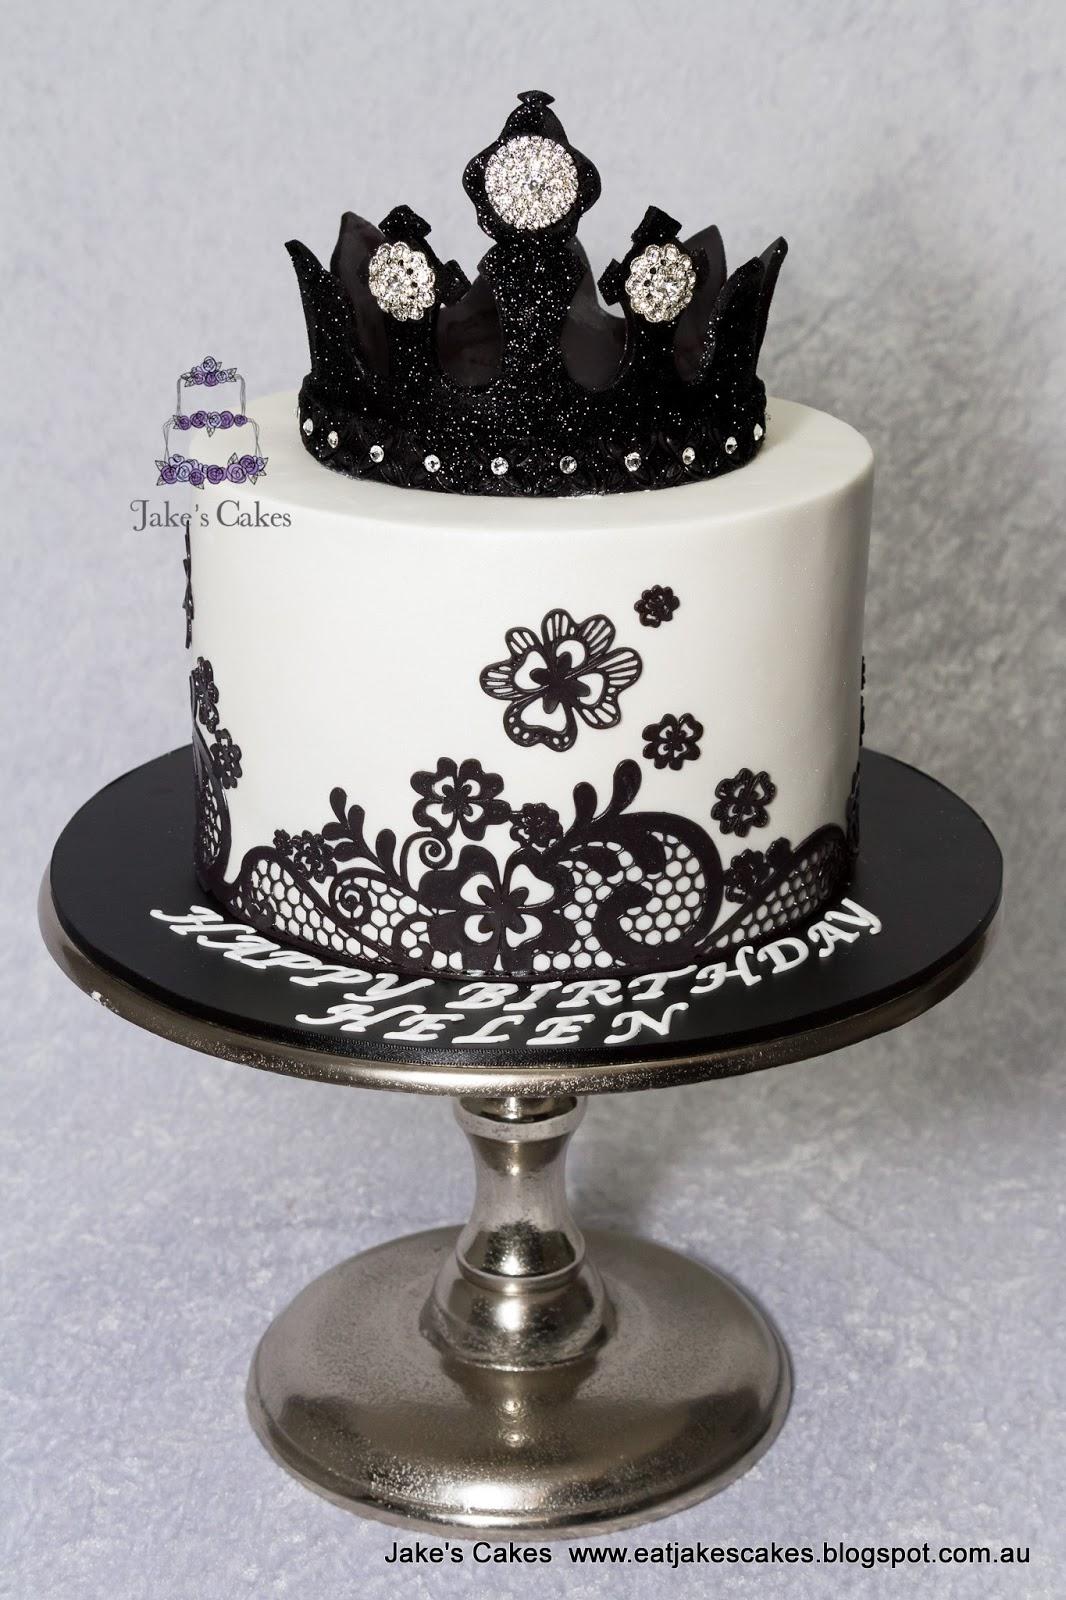 Jakes Cakes Black Bling Crown Cake